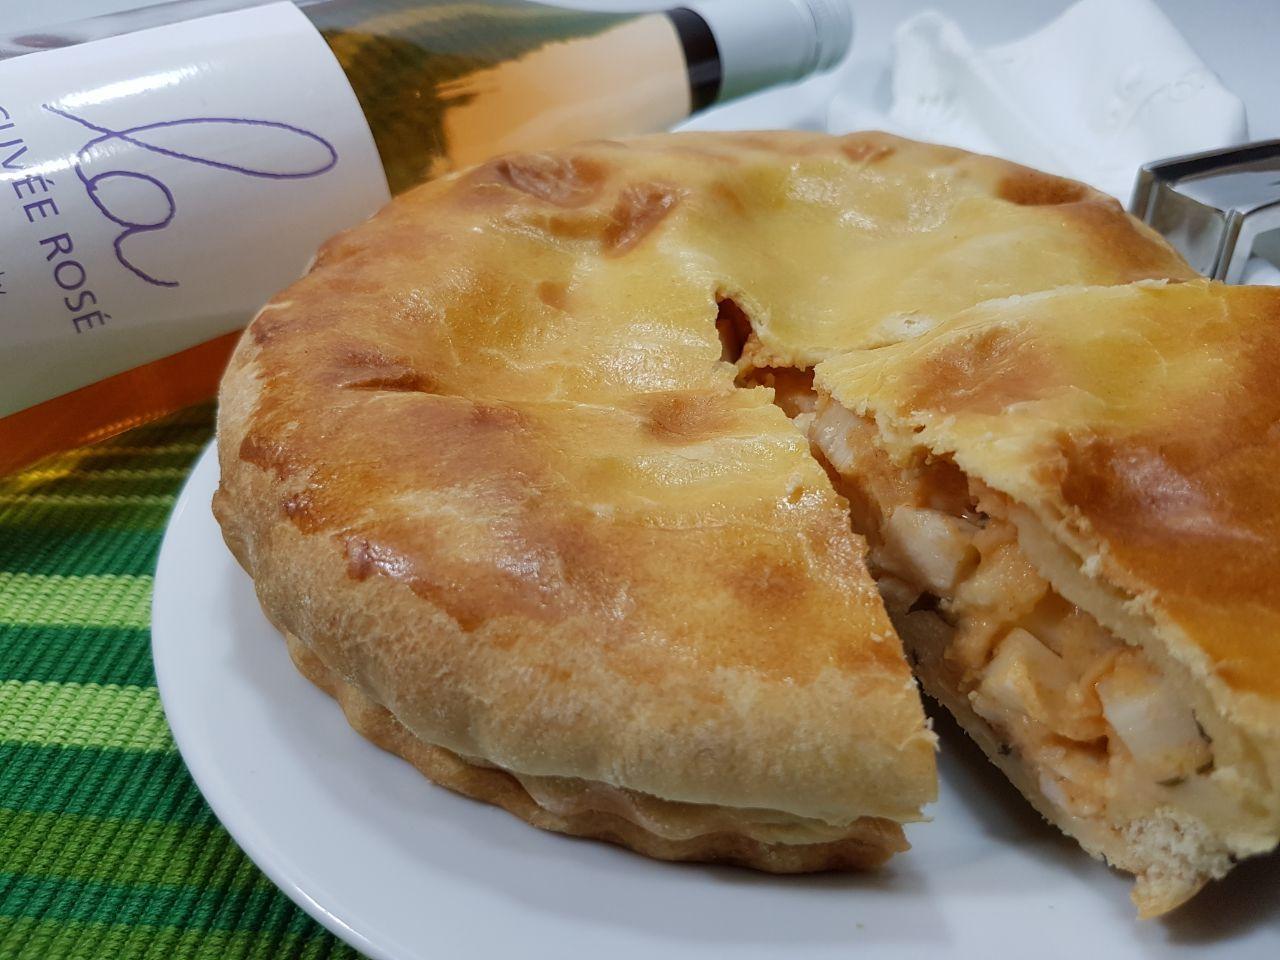 Kit Torta de Palmito Nova Benta 600g + Vinho Georges Duboeuf La Cuvée Rosé 750ml